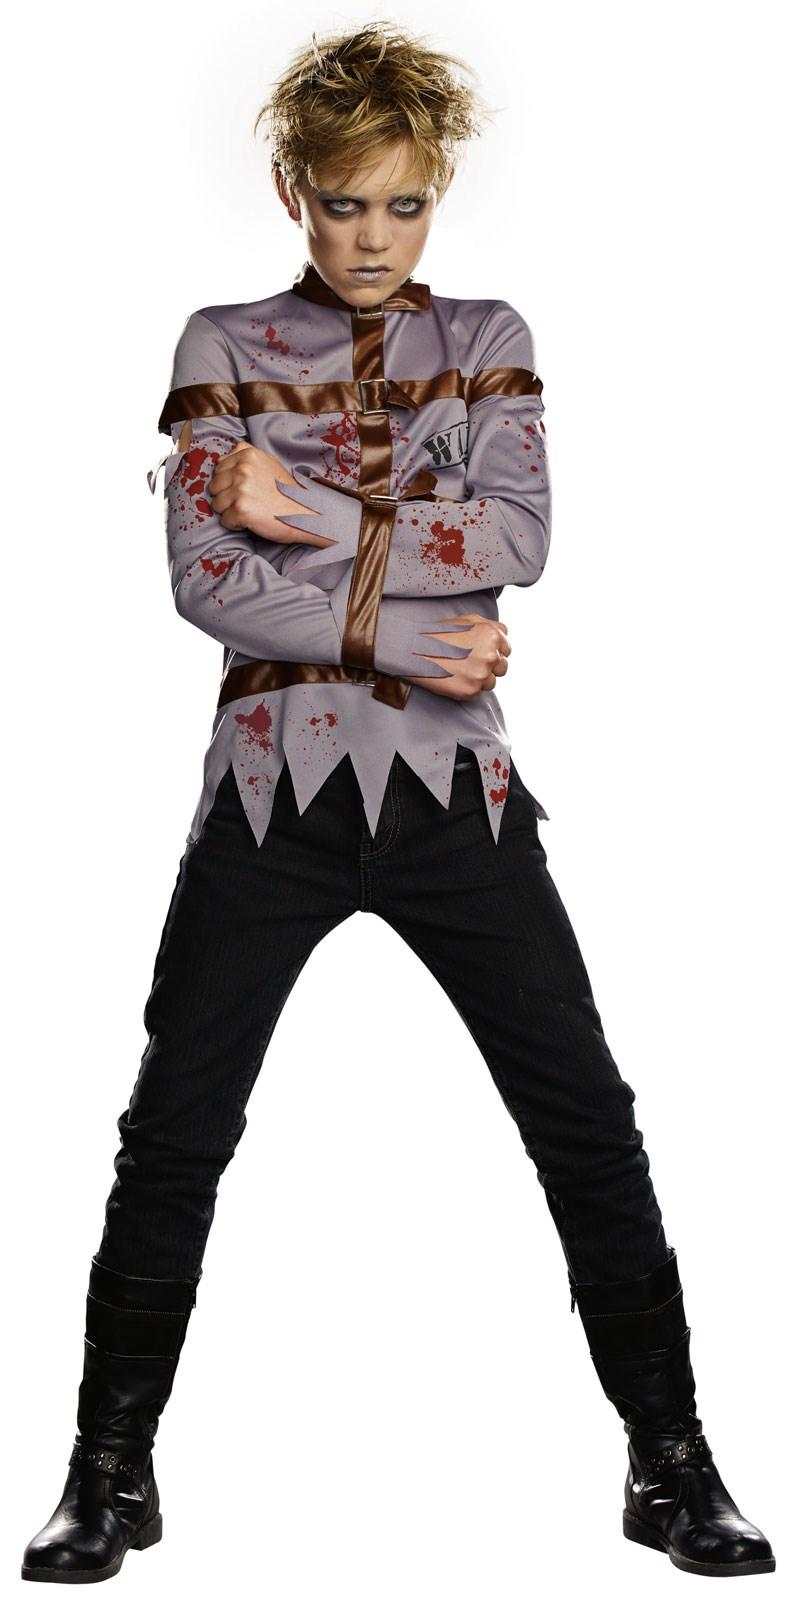 Straightjacket Zombie Kids Costume | BuyCostumes.com